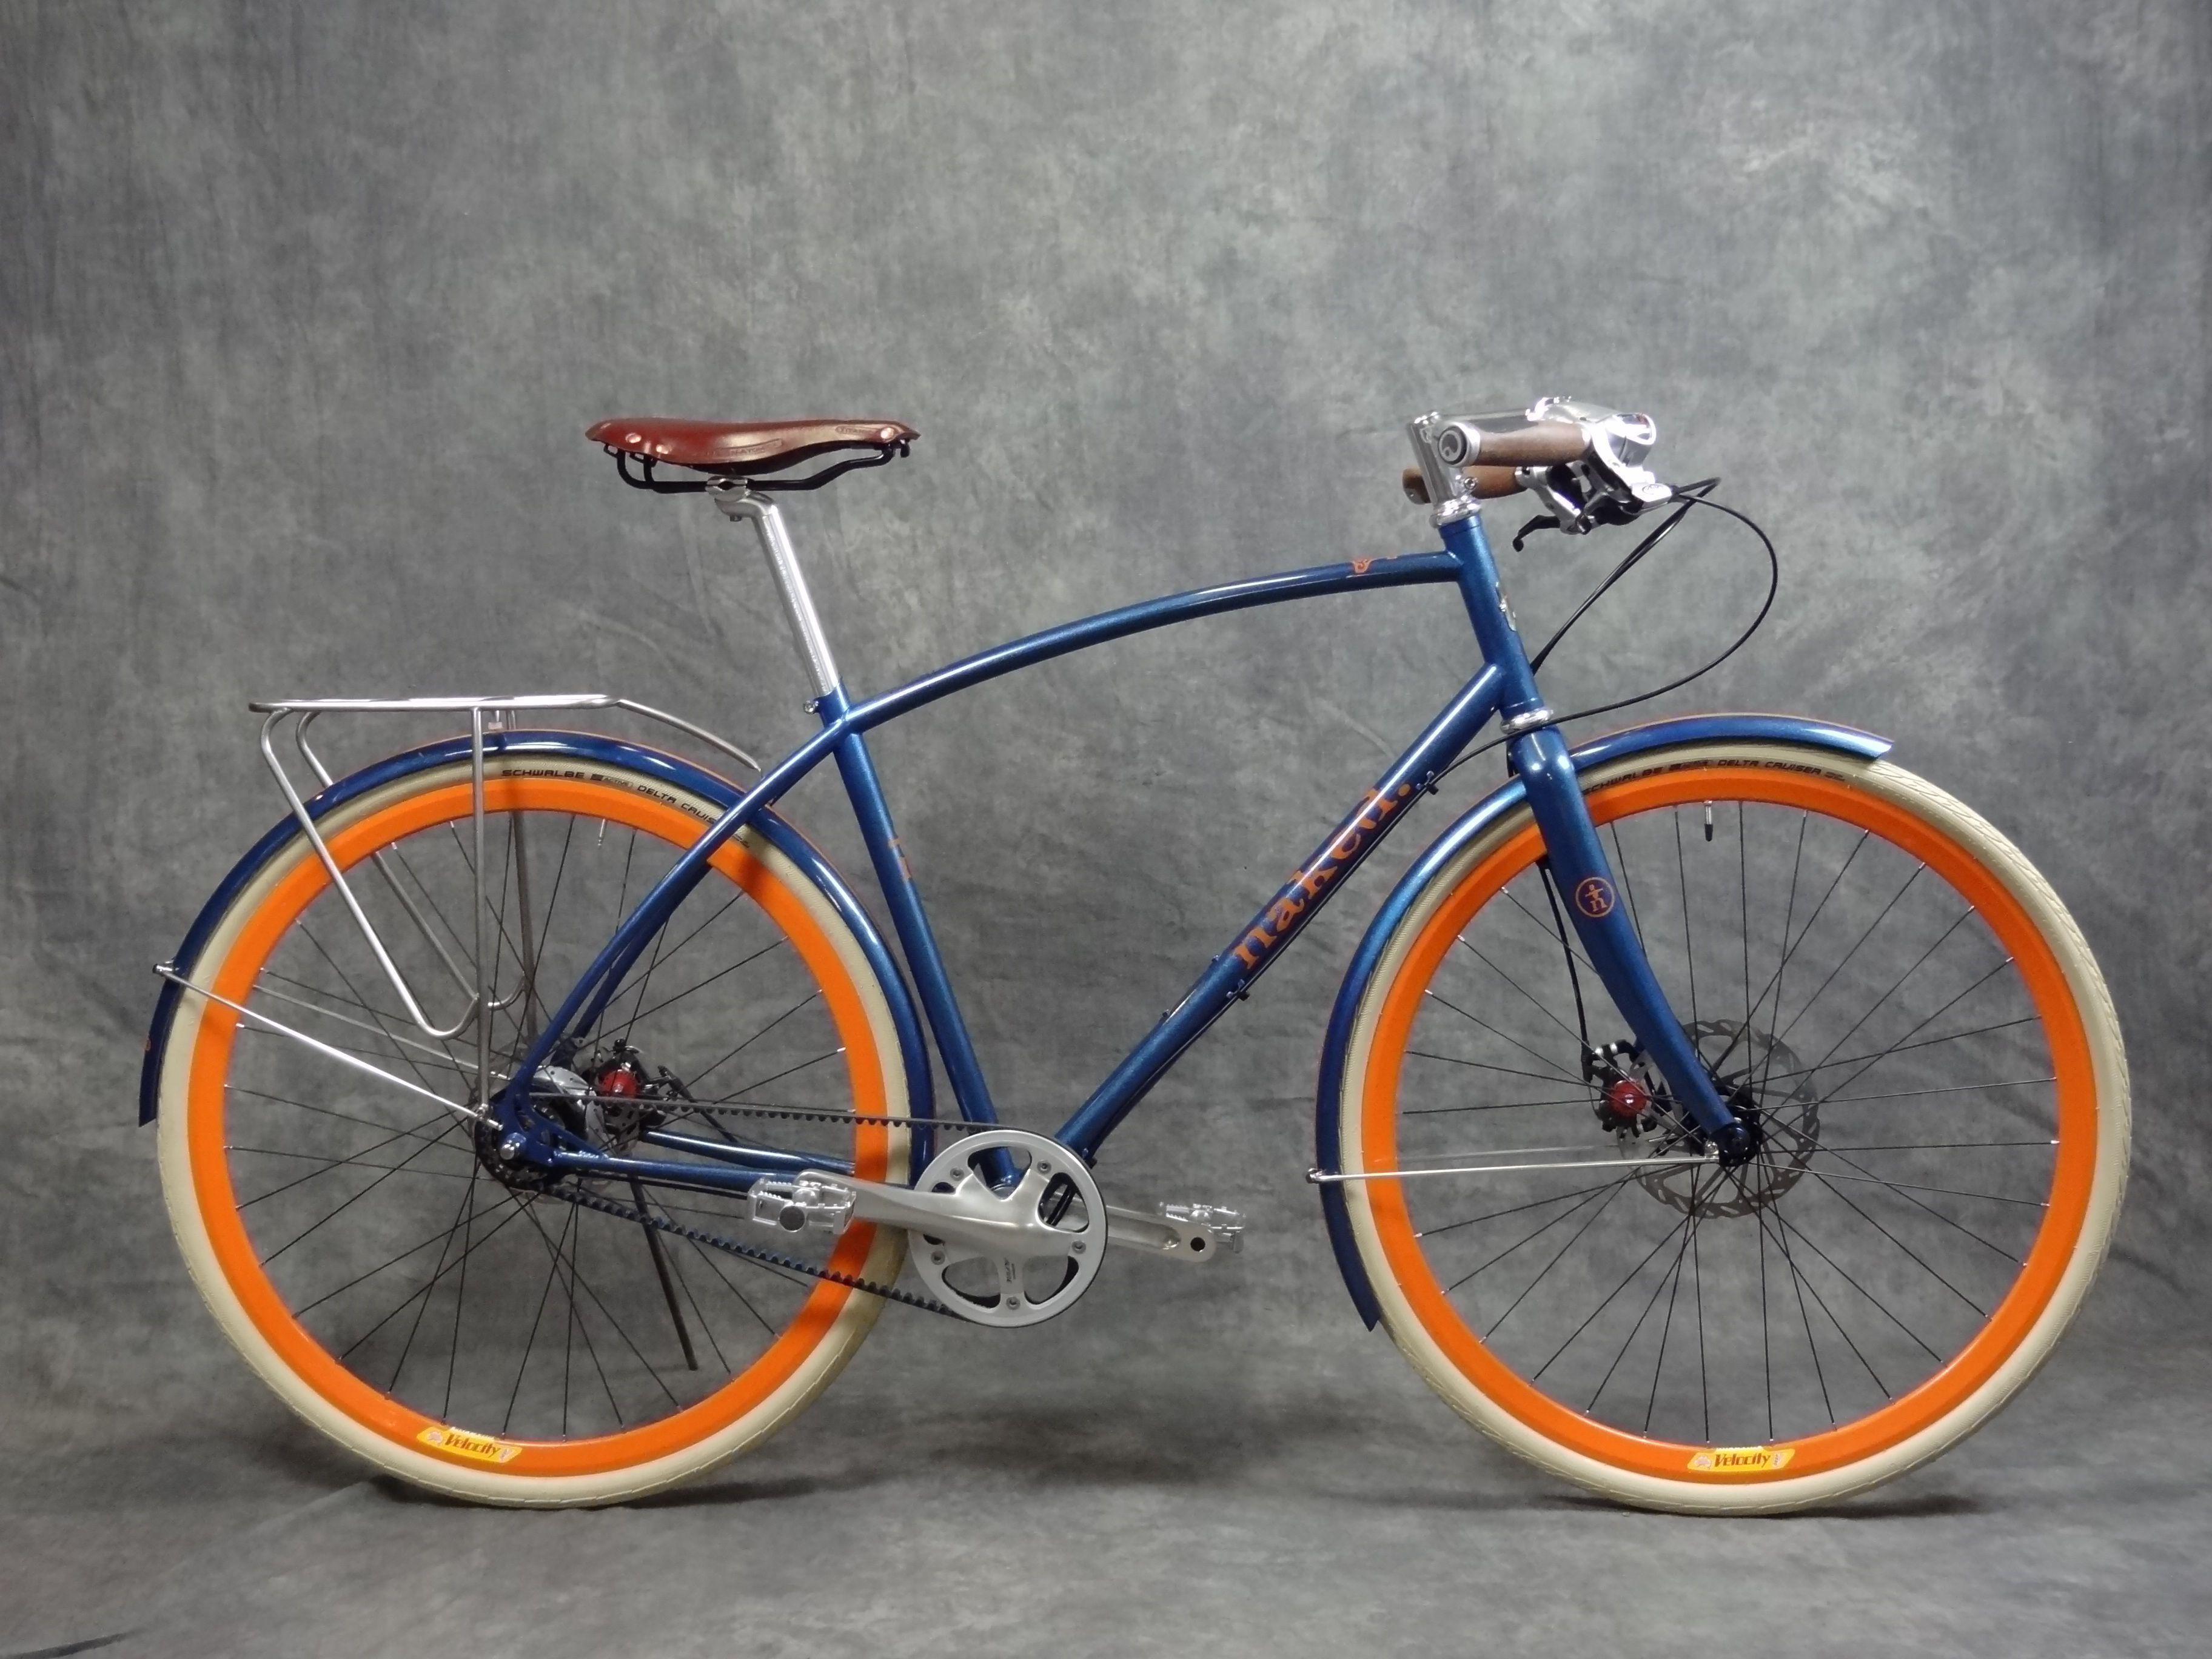 Pin On Bike Designs